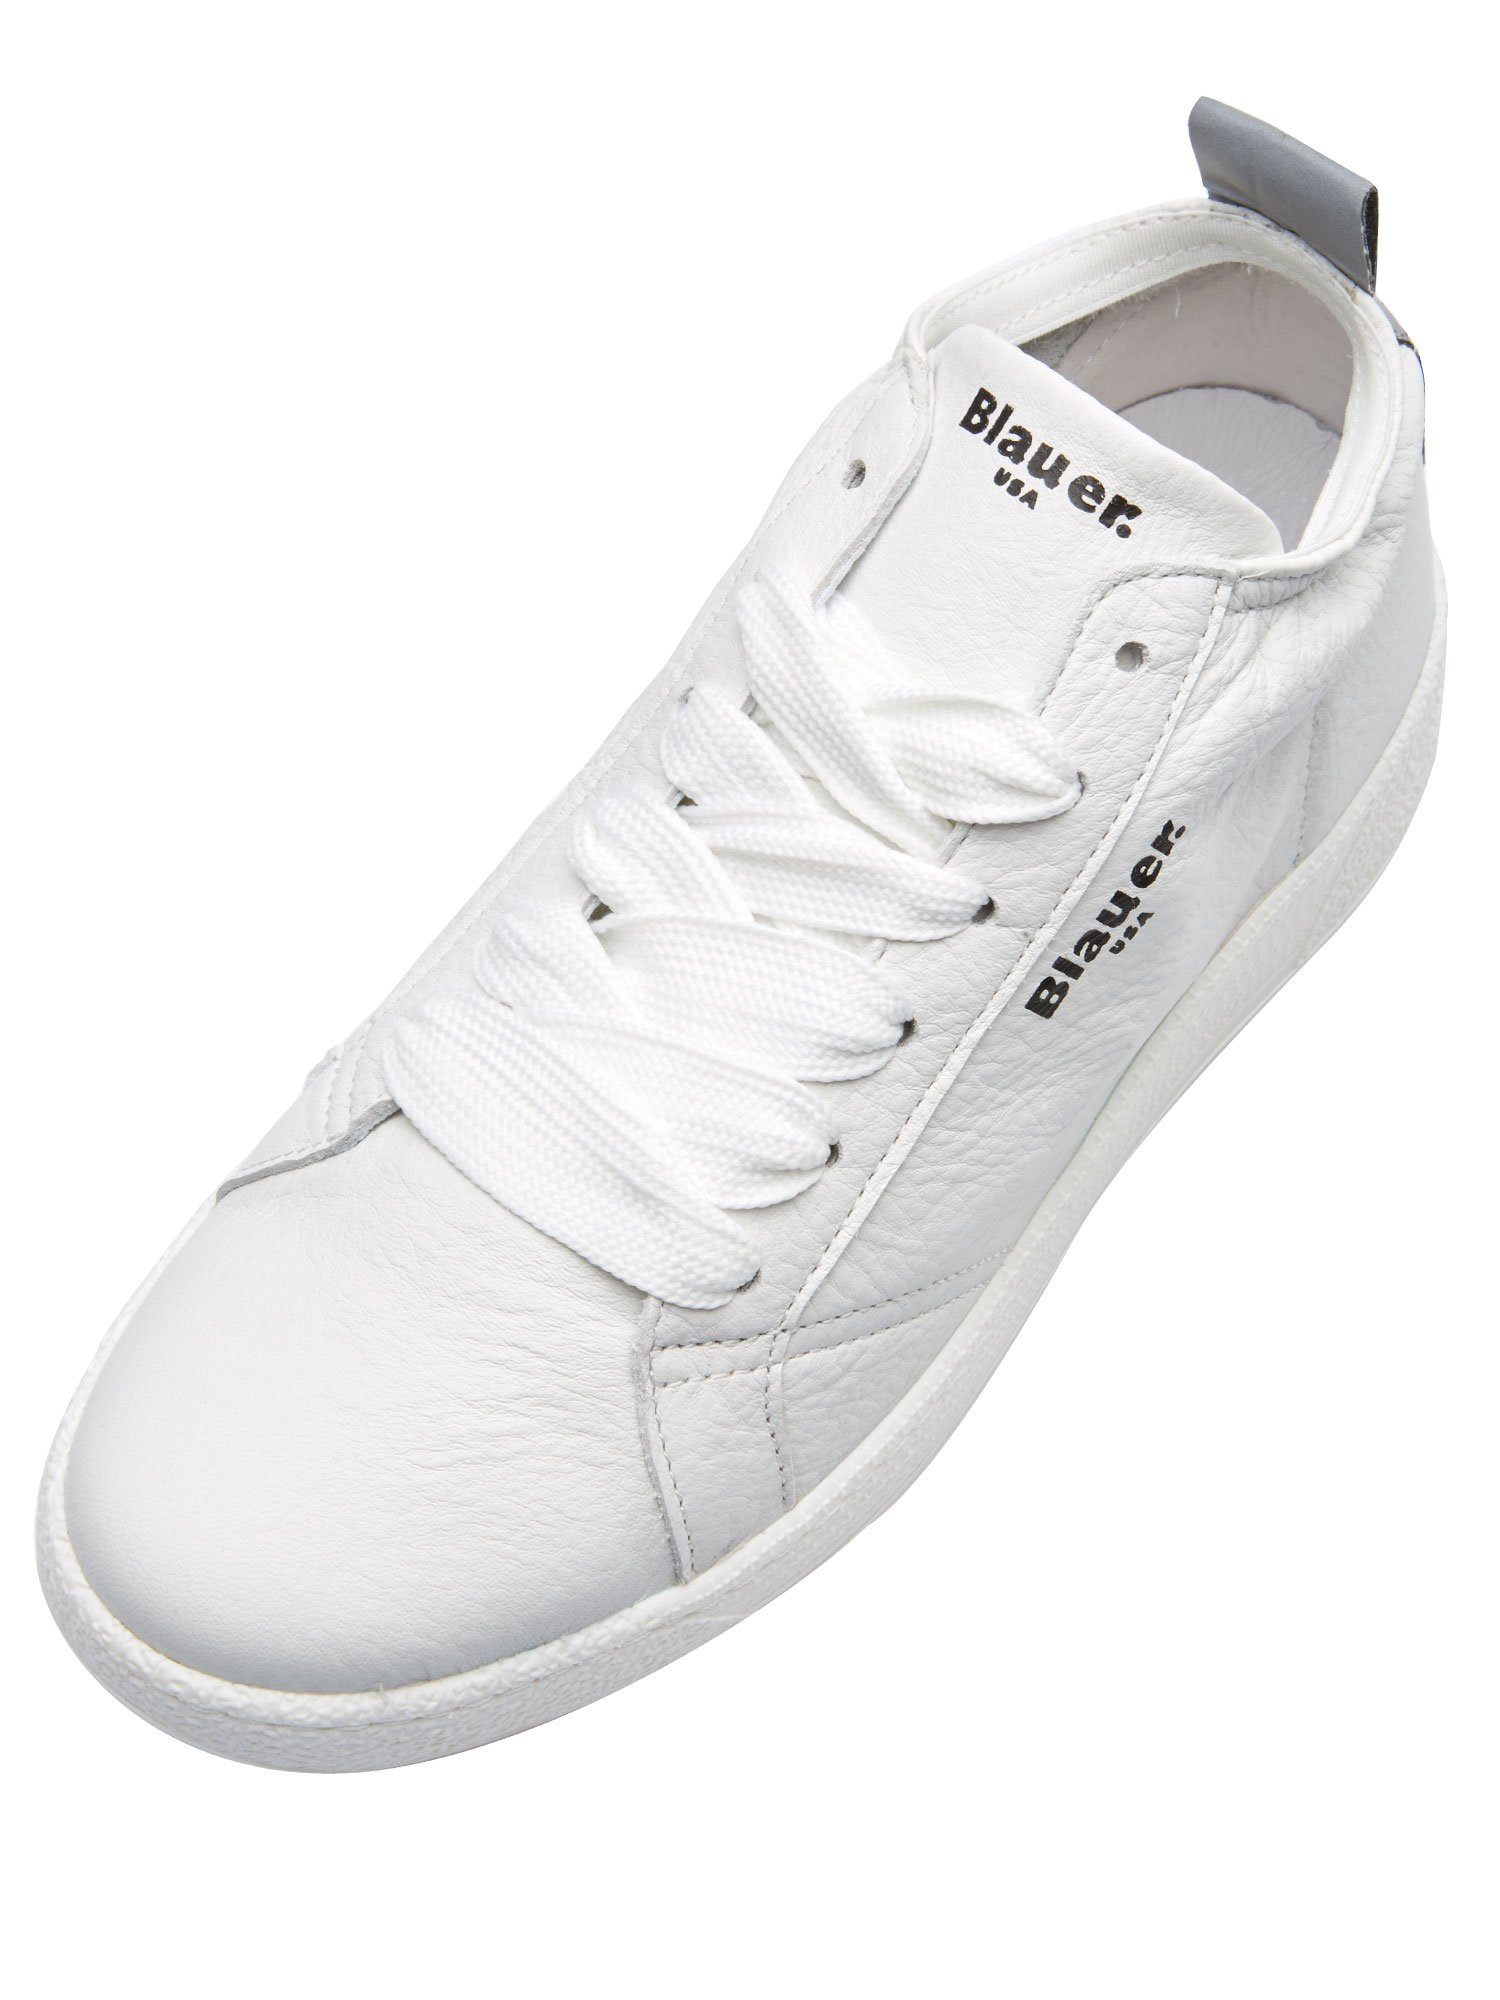 OLYMPIA LEA Sneakers alte - Bianco - Blauer